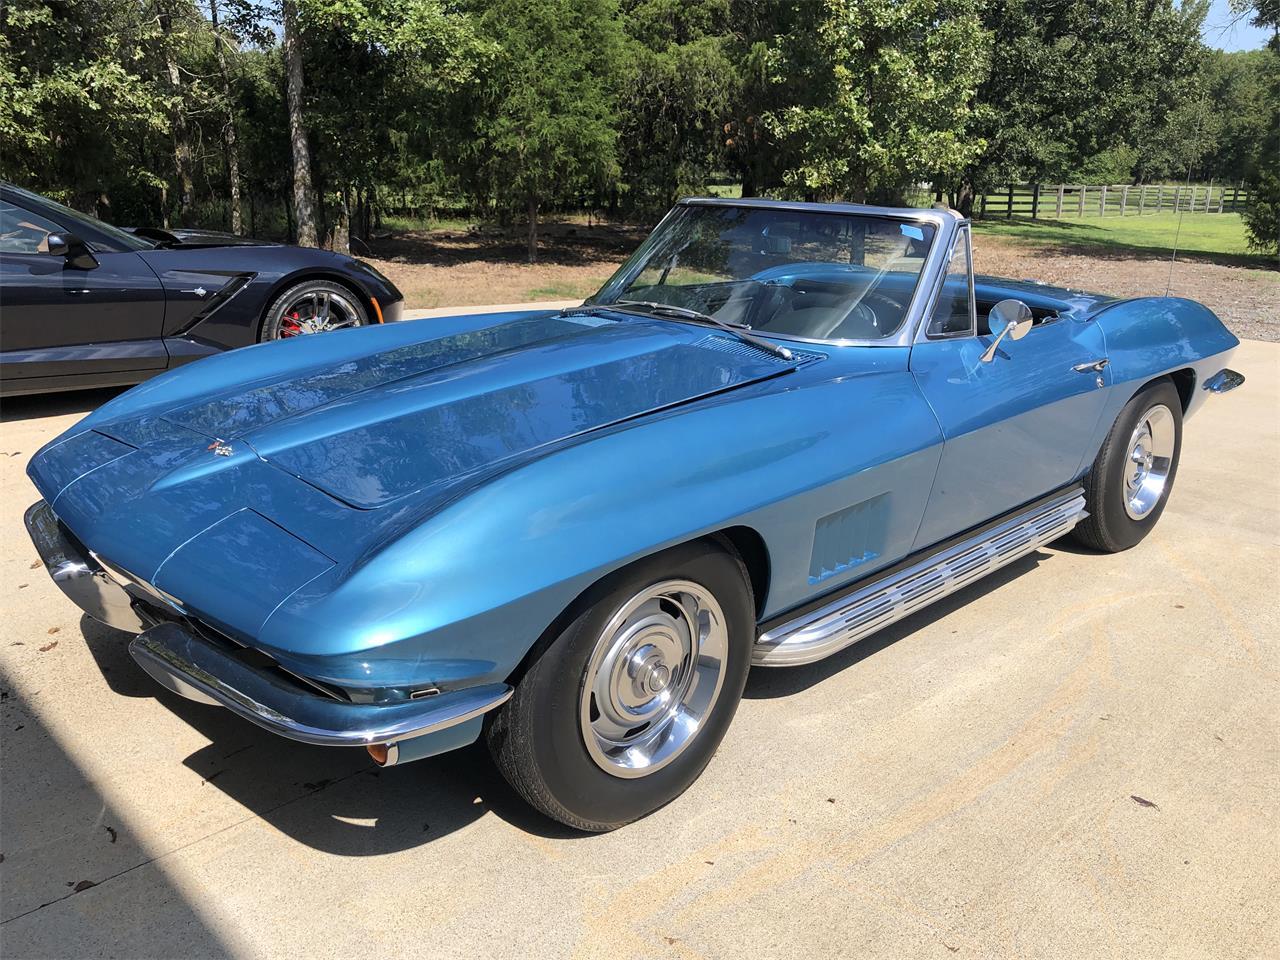 1967 Chevrolet Corvette (CC-1303156) for sale in Scottsdale, Arizona